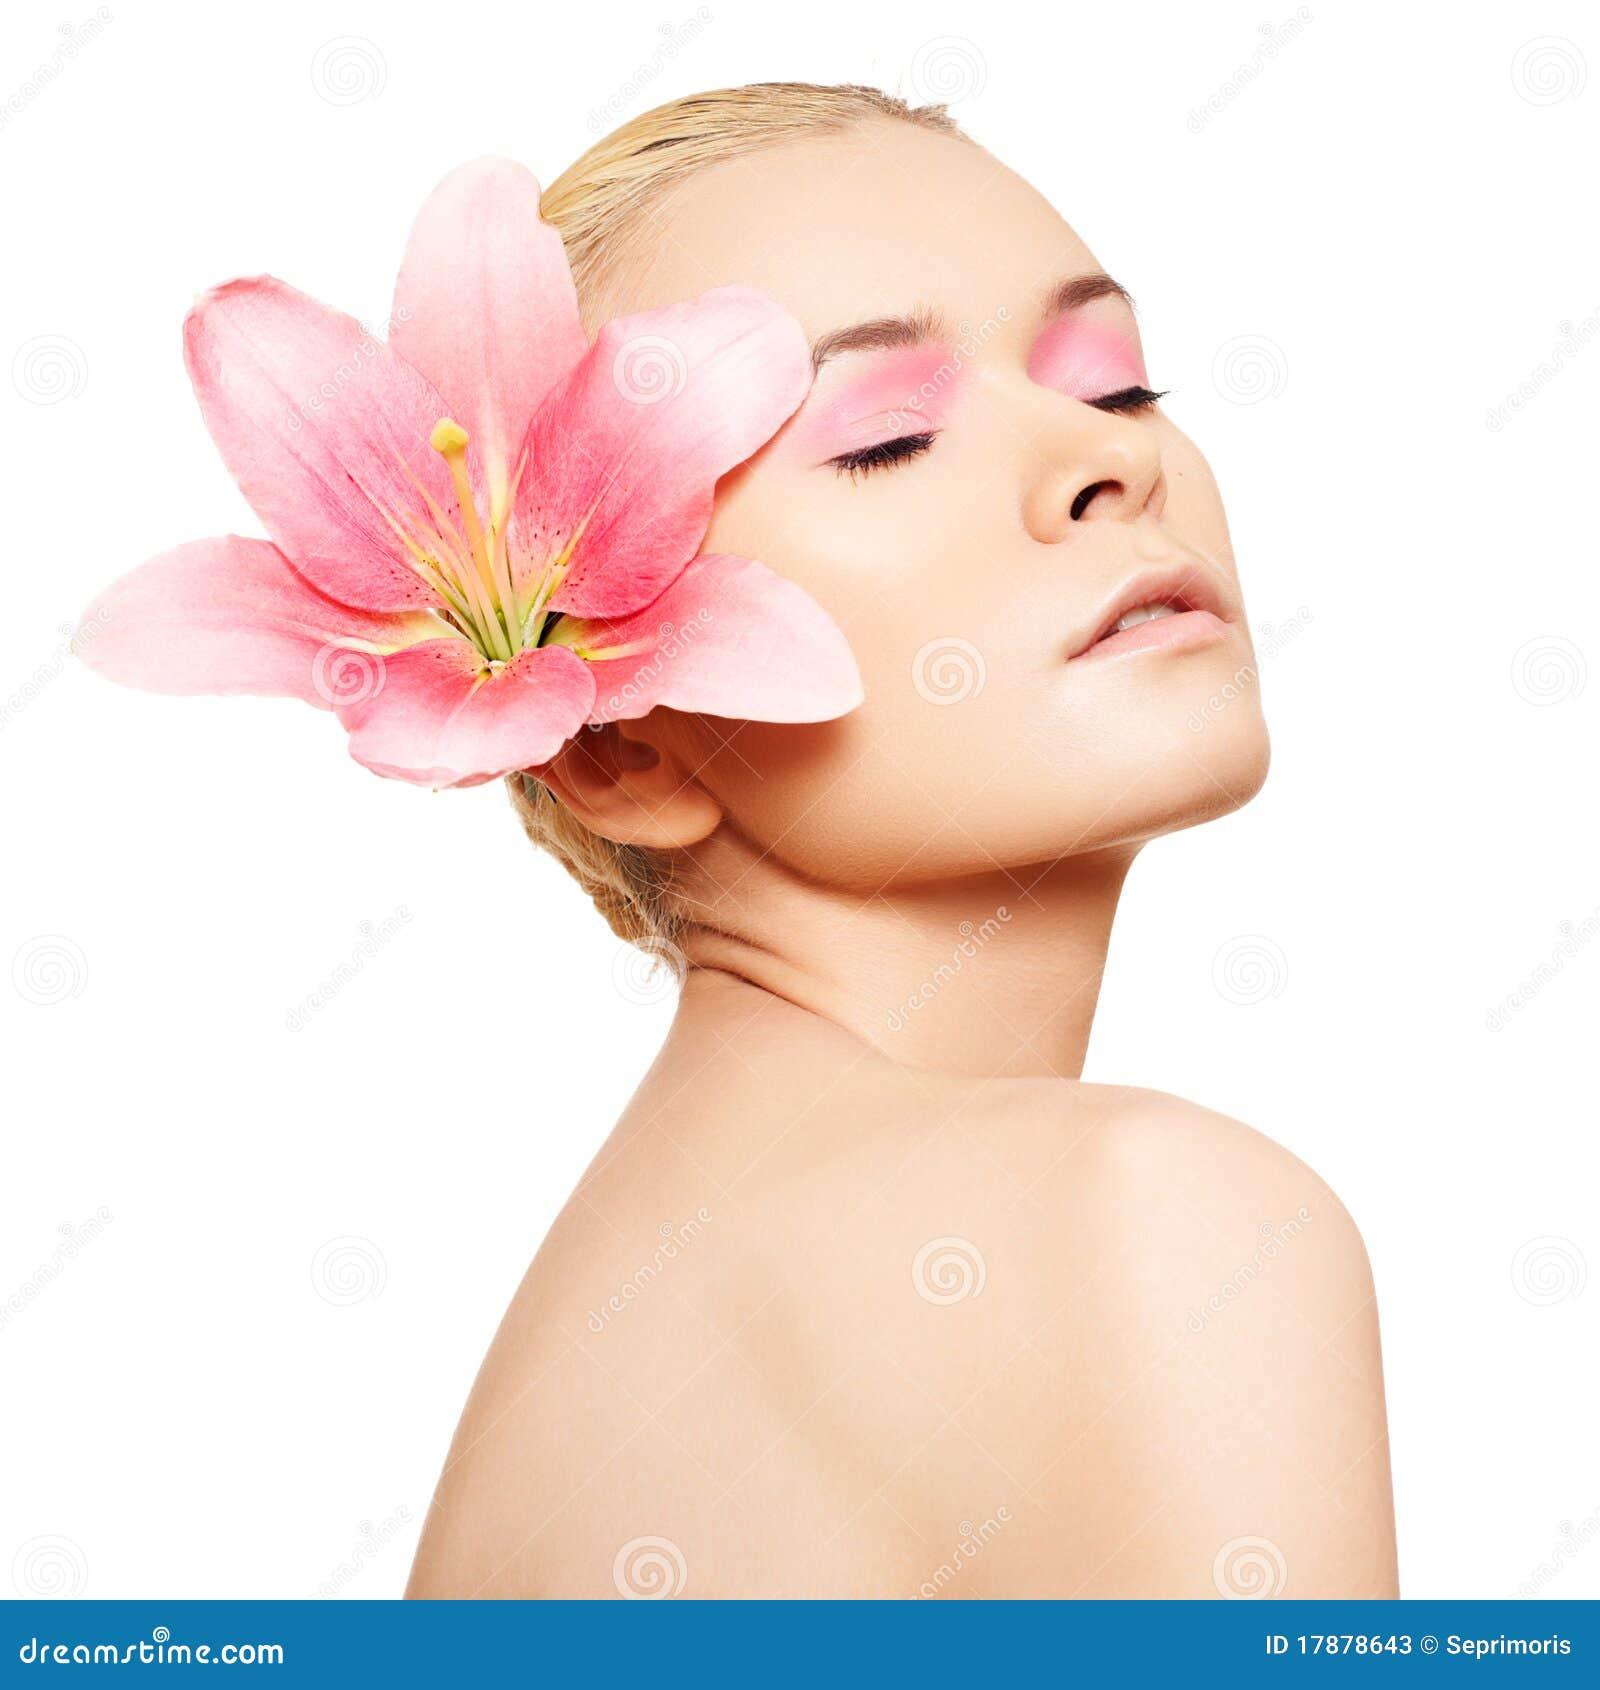 nøgen wellness skin & beauty køge